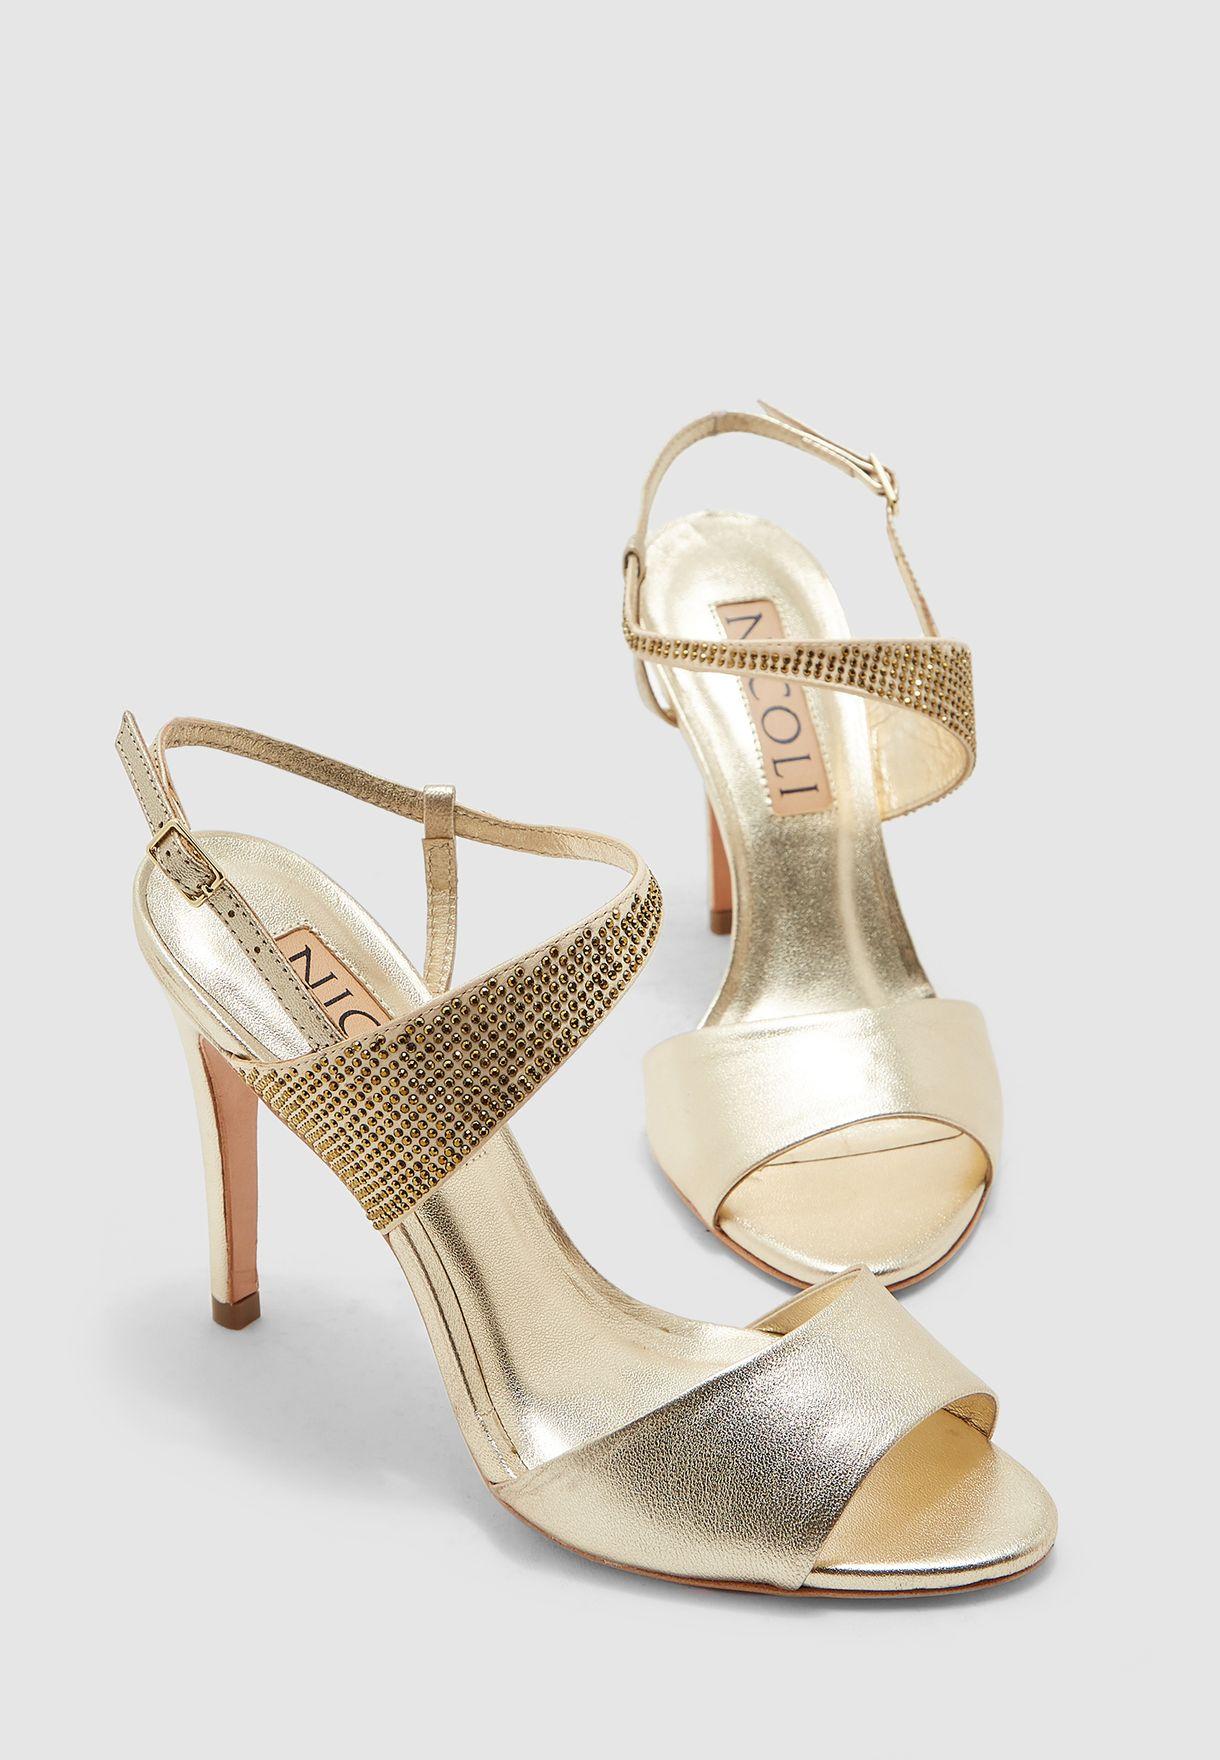 Lorena Ankle Strap Buckled Mid Heel Sandal